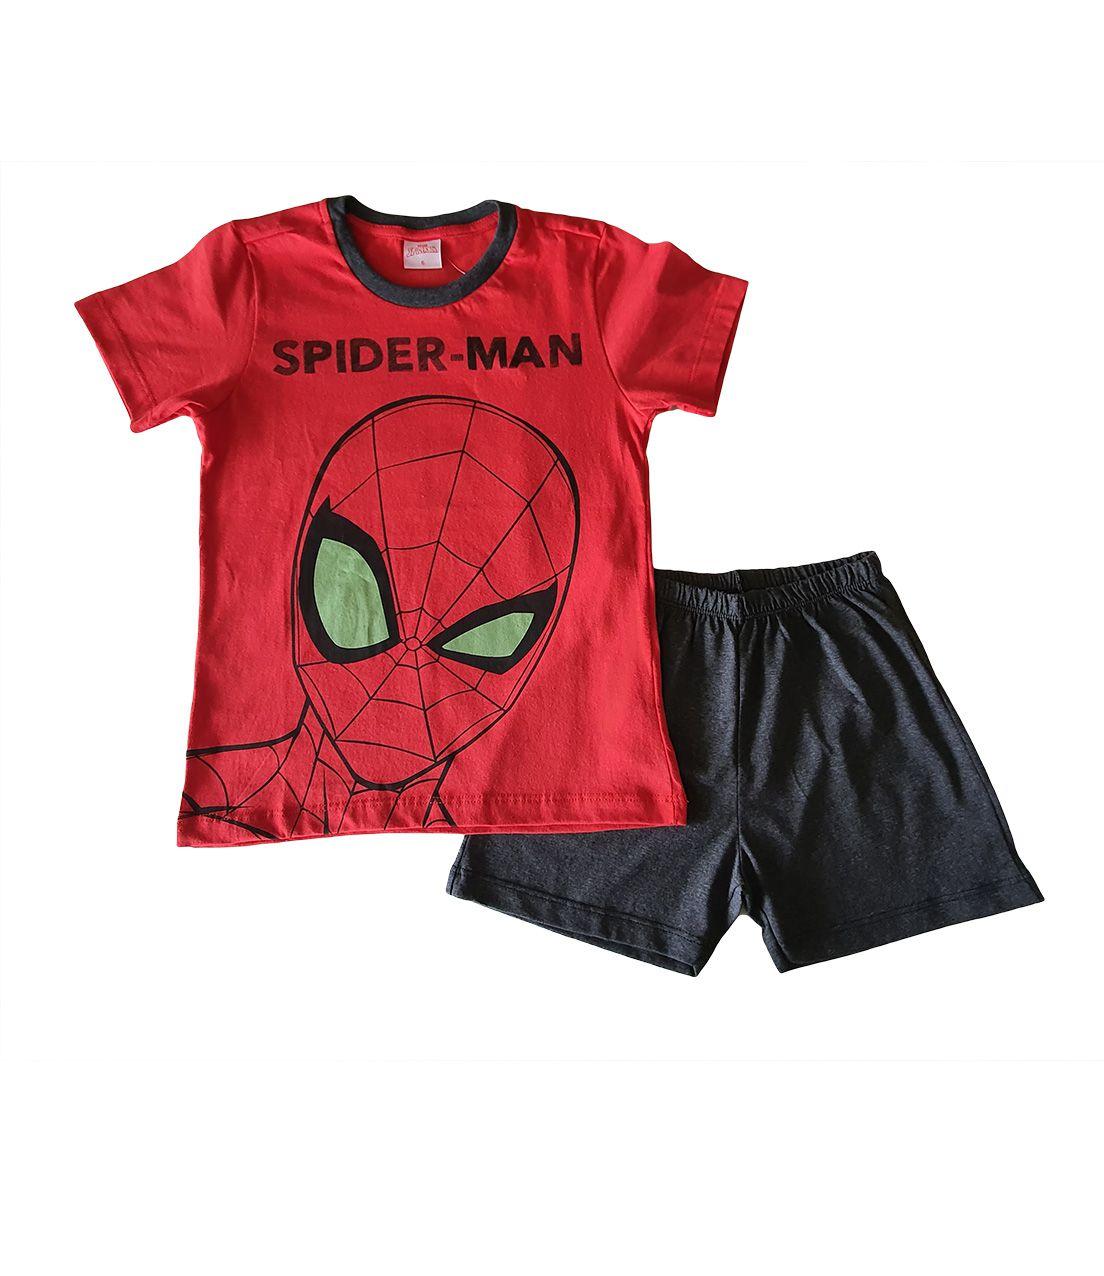 Pijama Infantil Camiseta Manga curta e Shorts Evanilda  Spider Man Vermelho e Chumbo